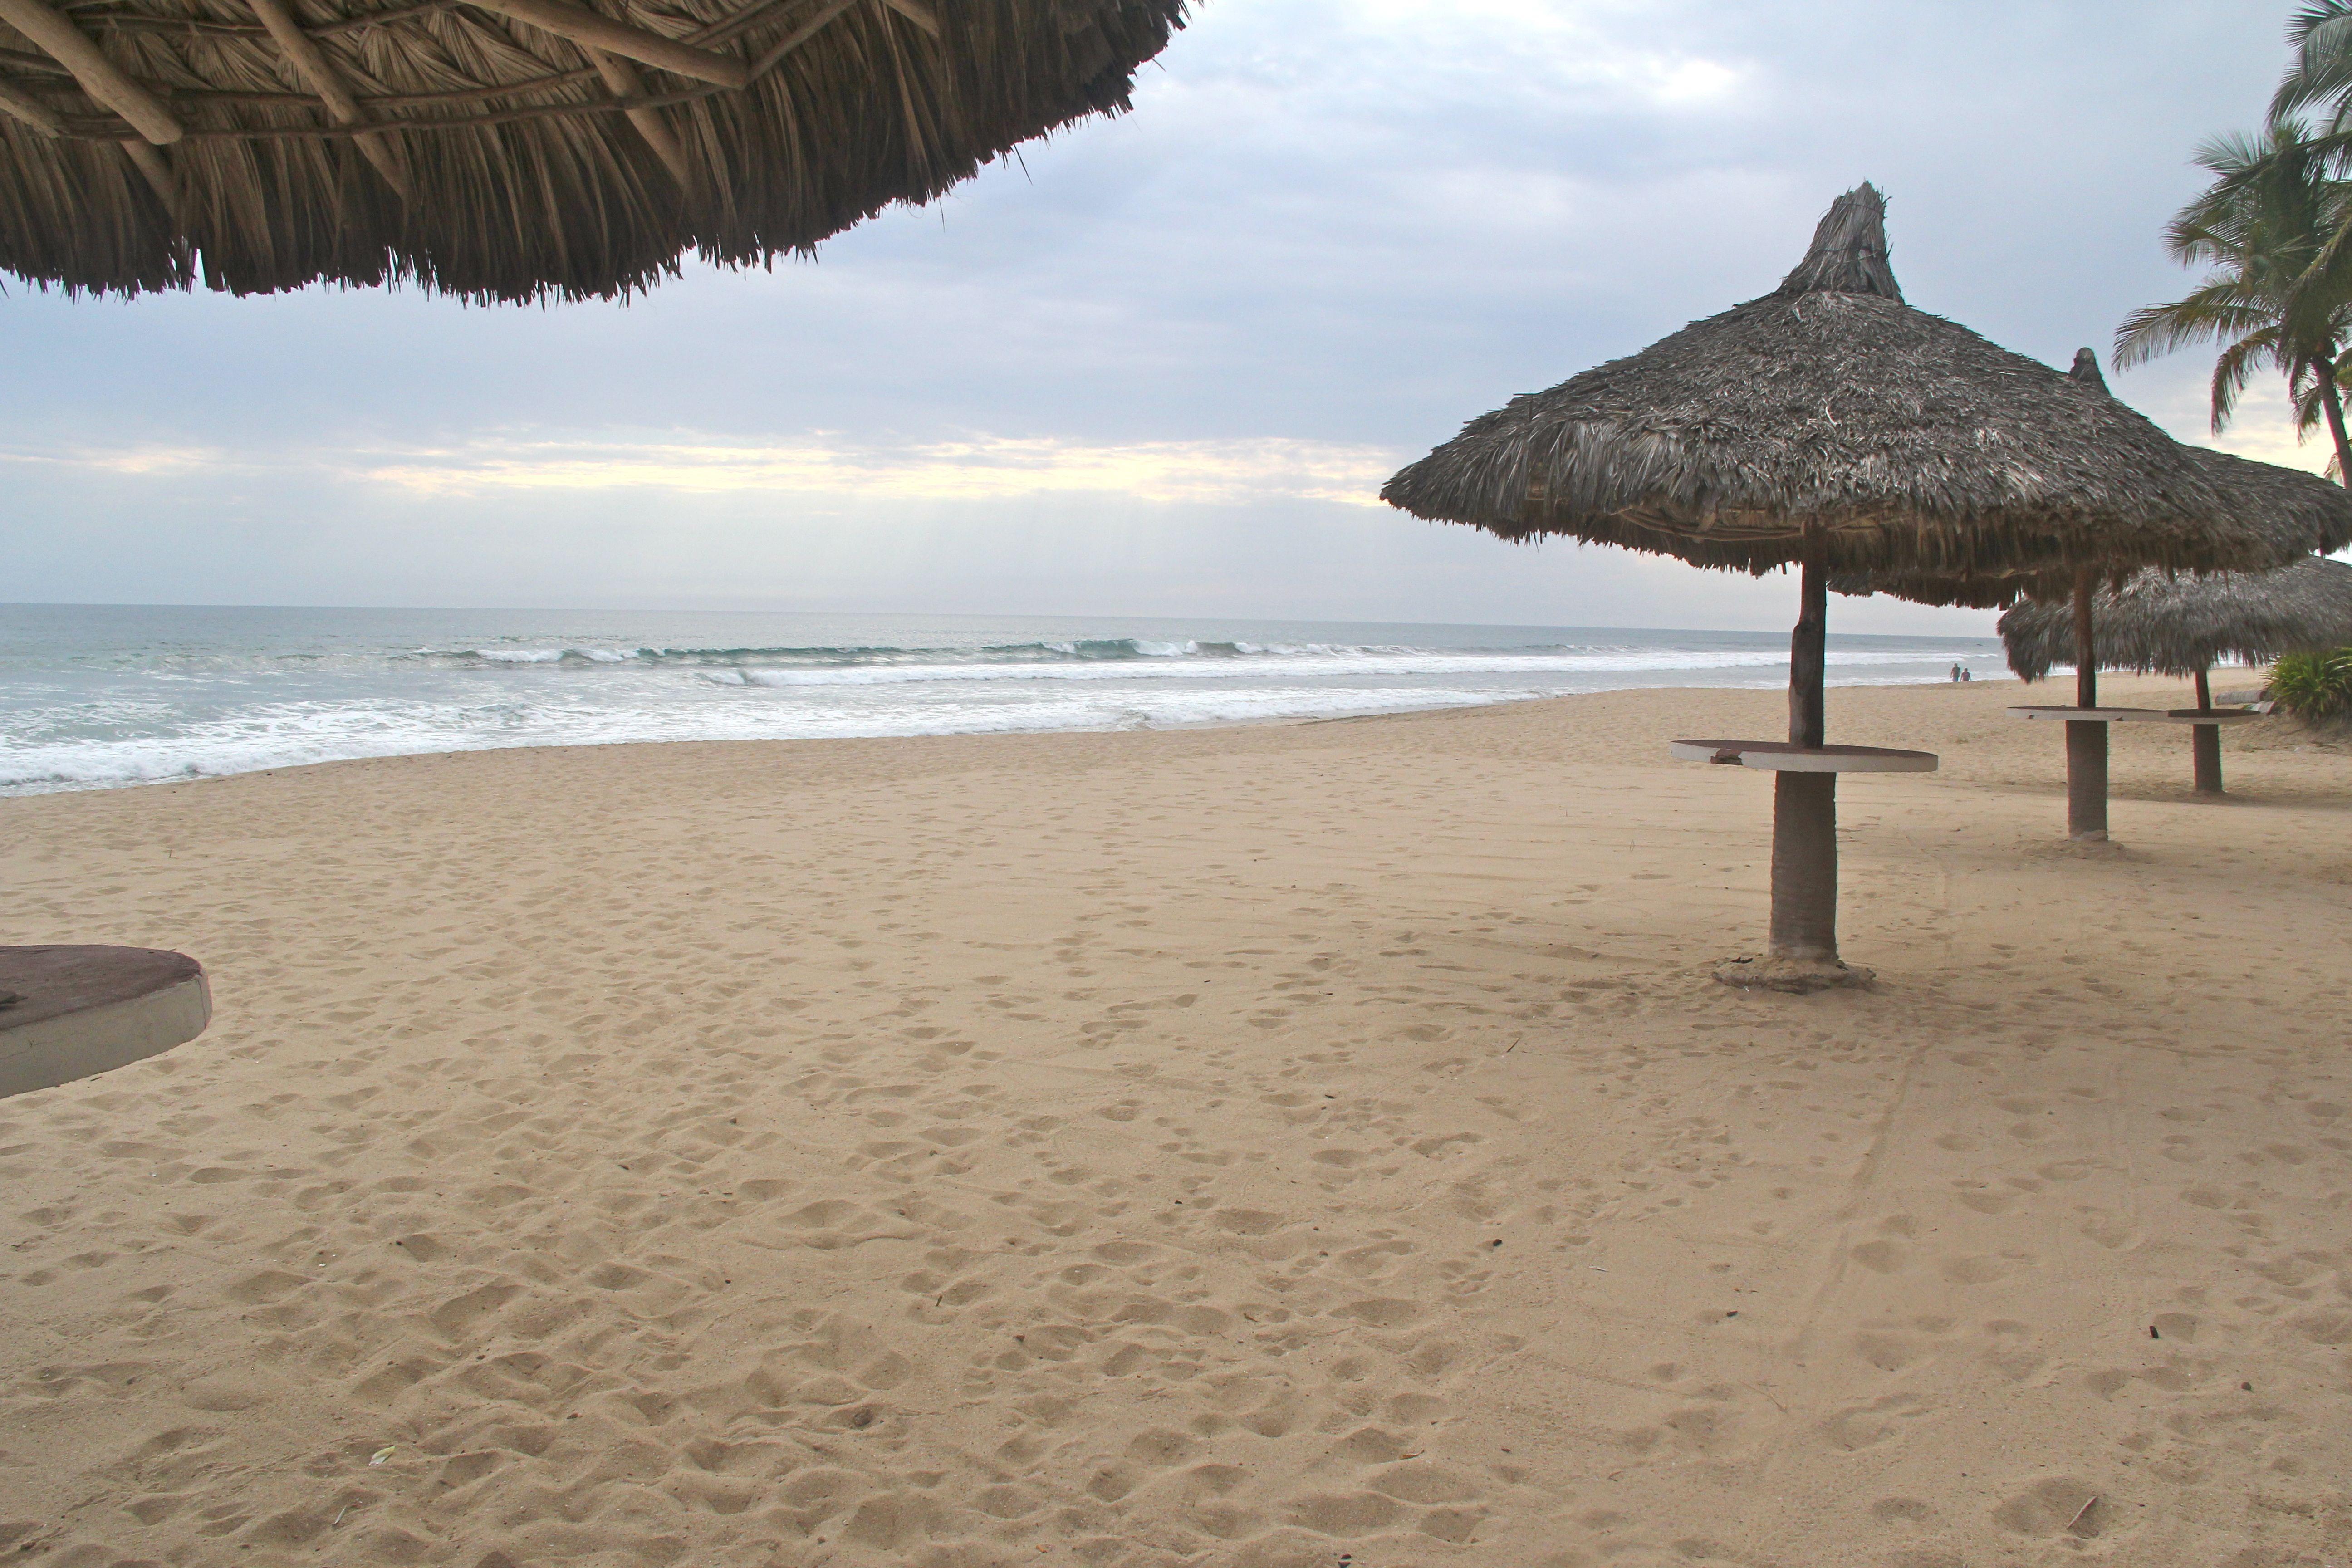 Private beach palapas